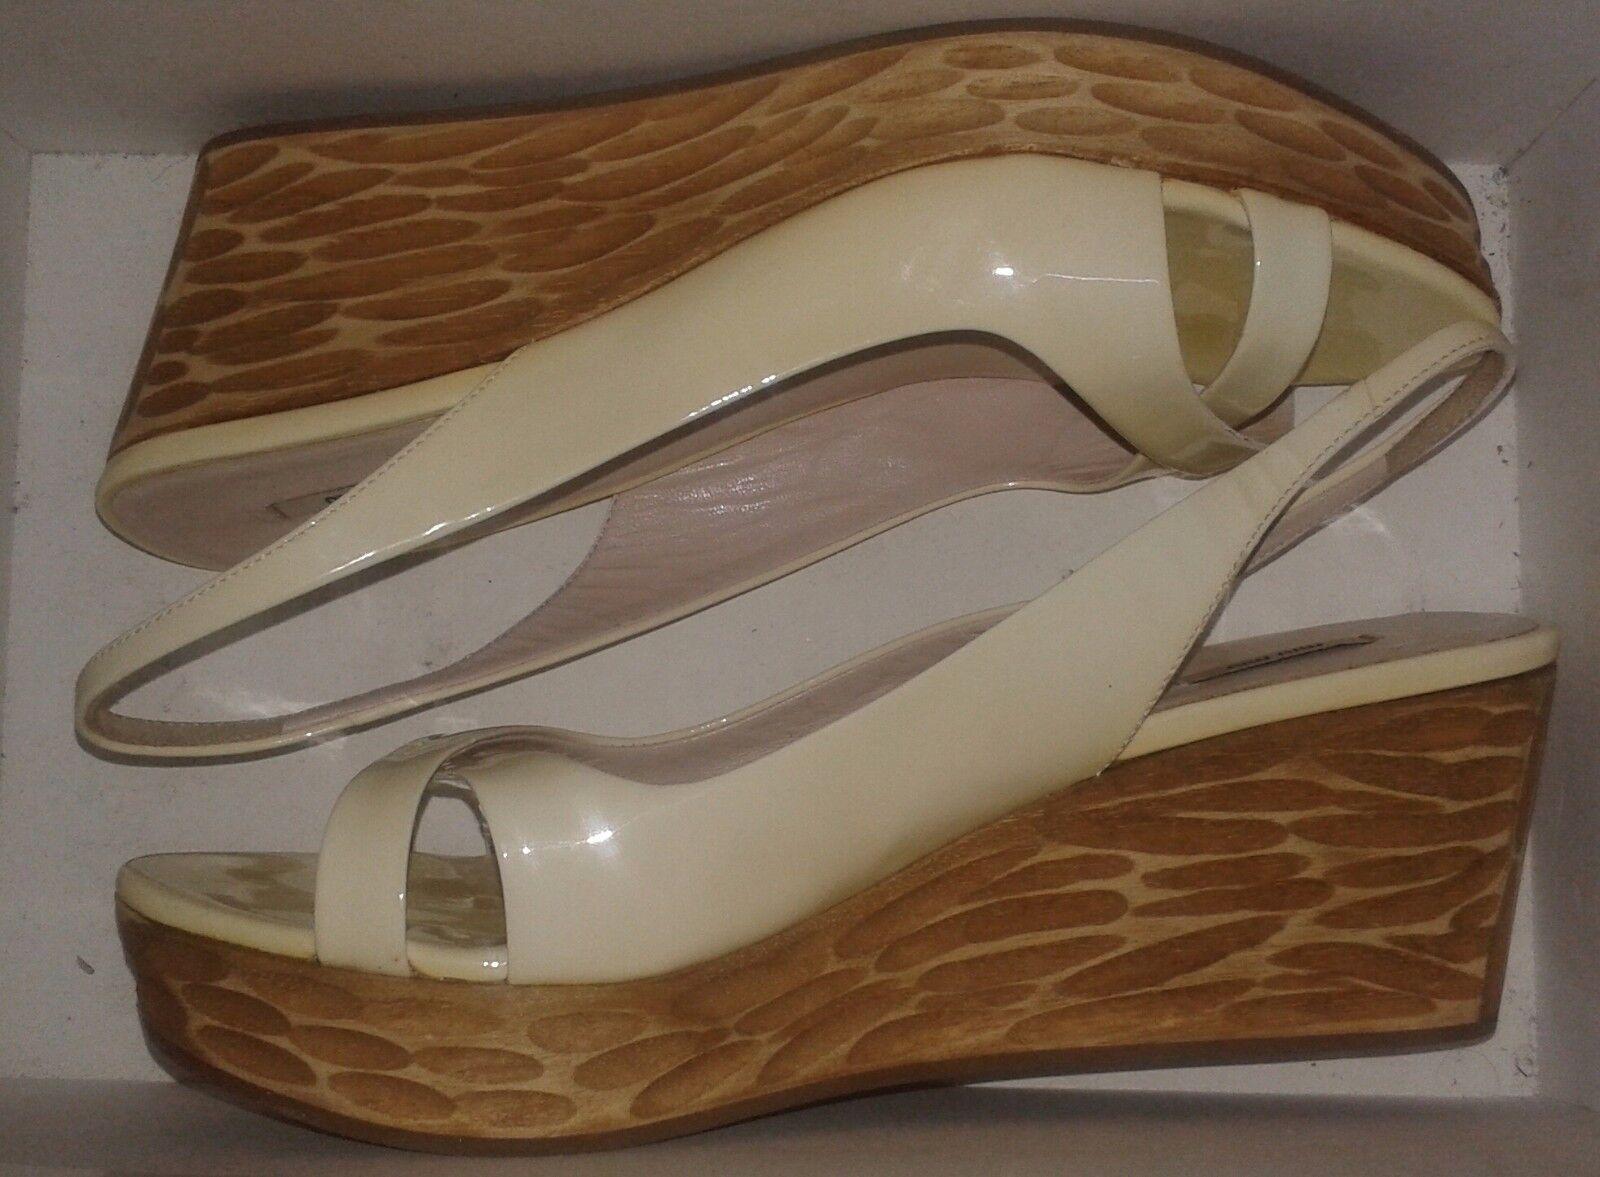 Miu Miu (Prada) Light Mustard Wedge Heel Slingback Sandals - UK 5.5   EUR 38